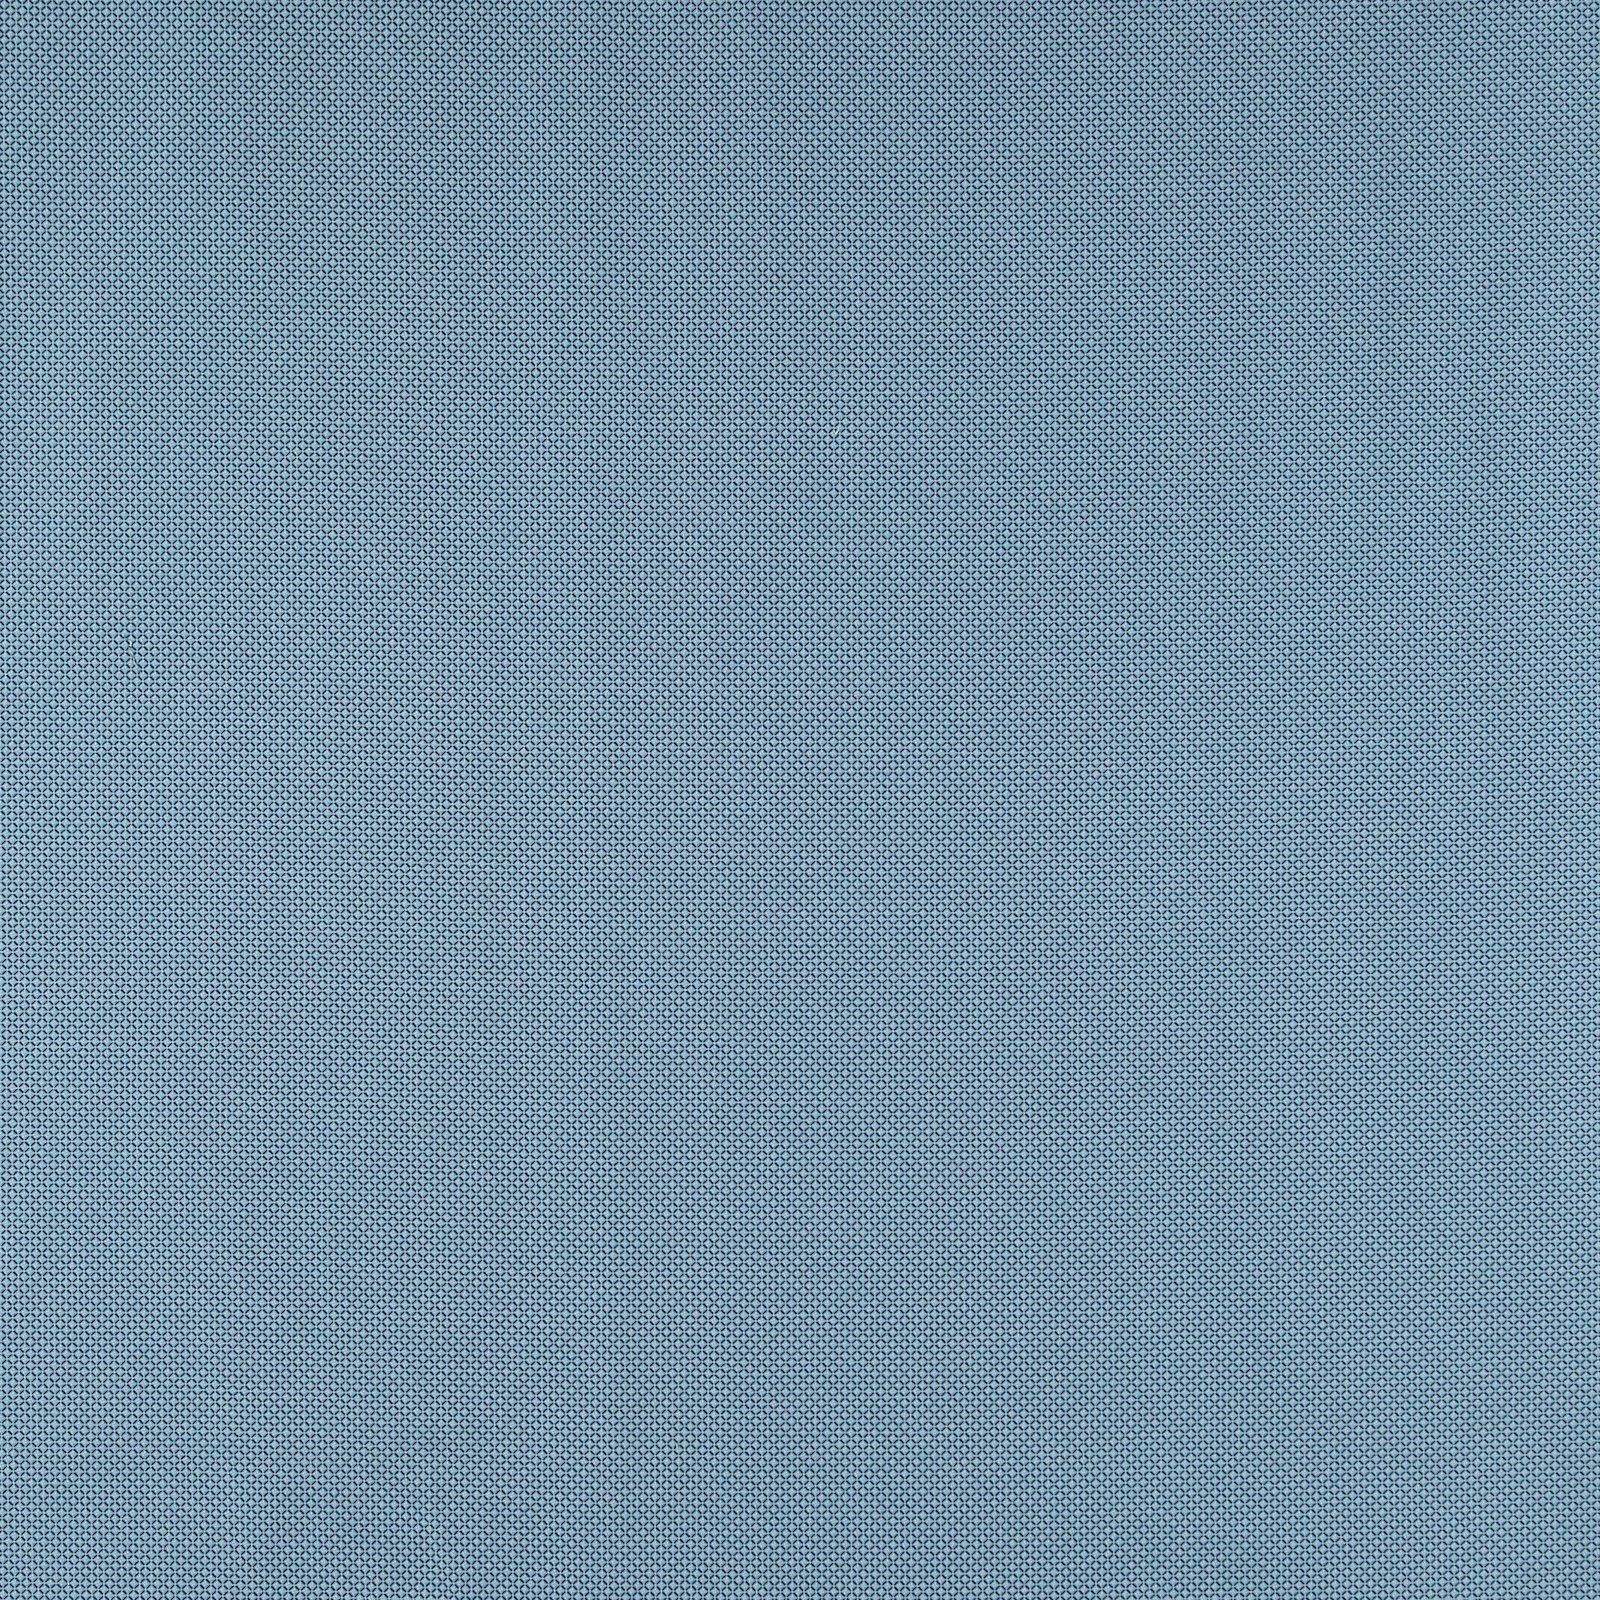 Cotton light blue graphic pattern 852405_pack_sp